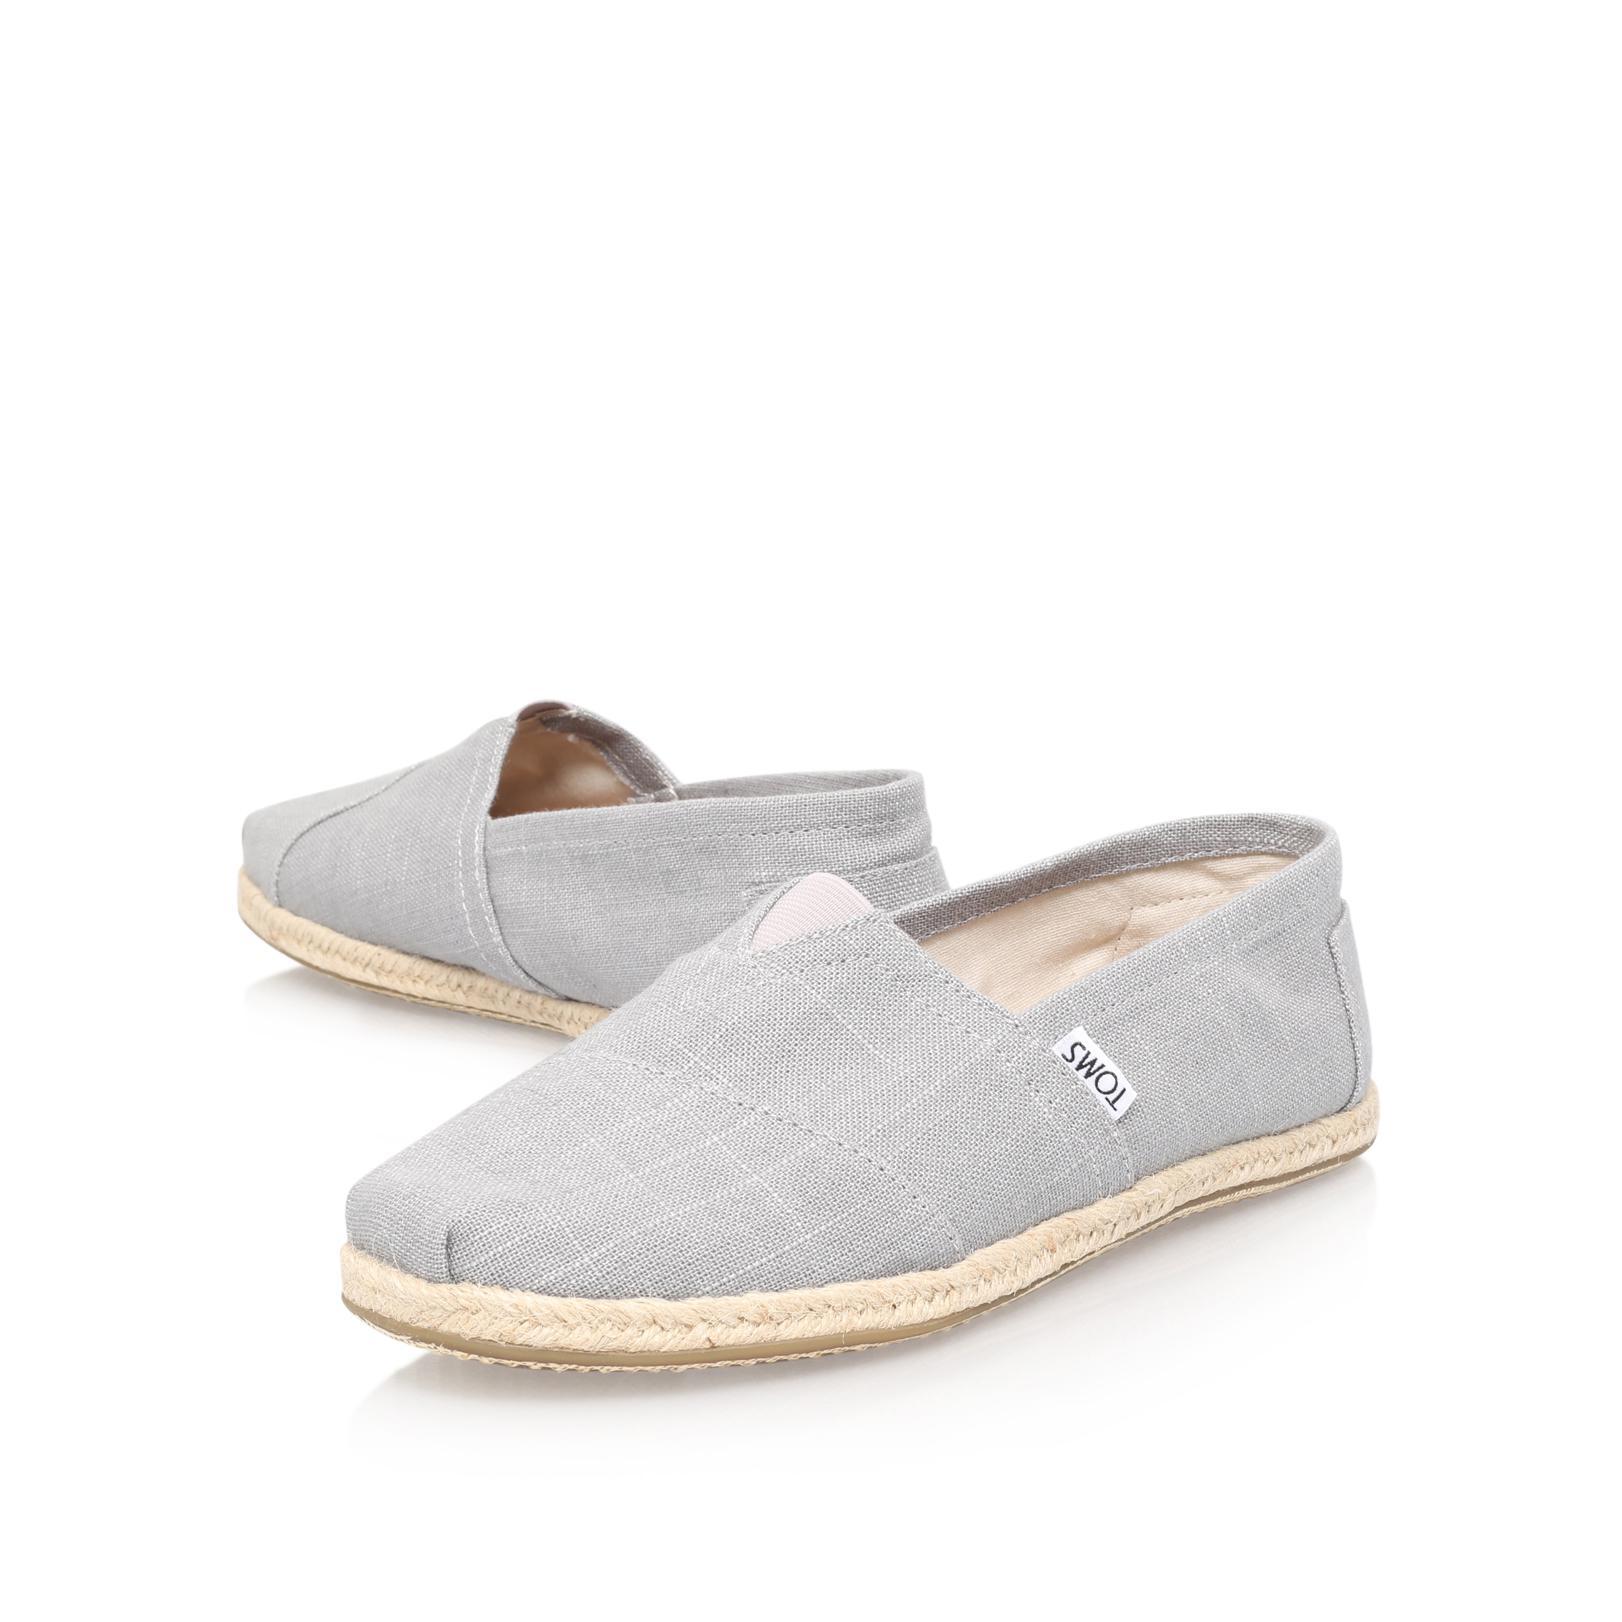 TOMS Alpargata Linen Esp in Grey (Grey) for Men